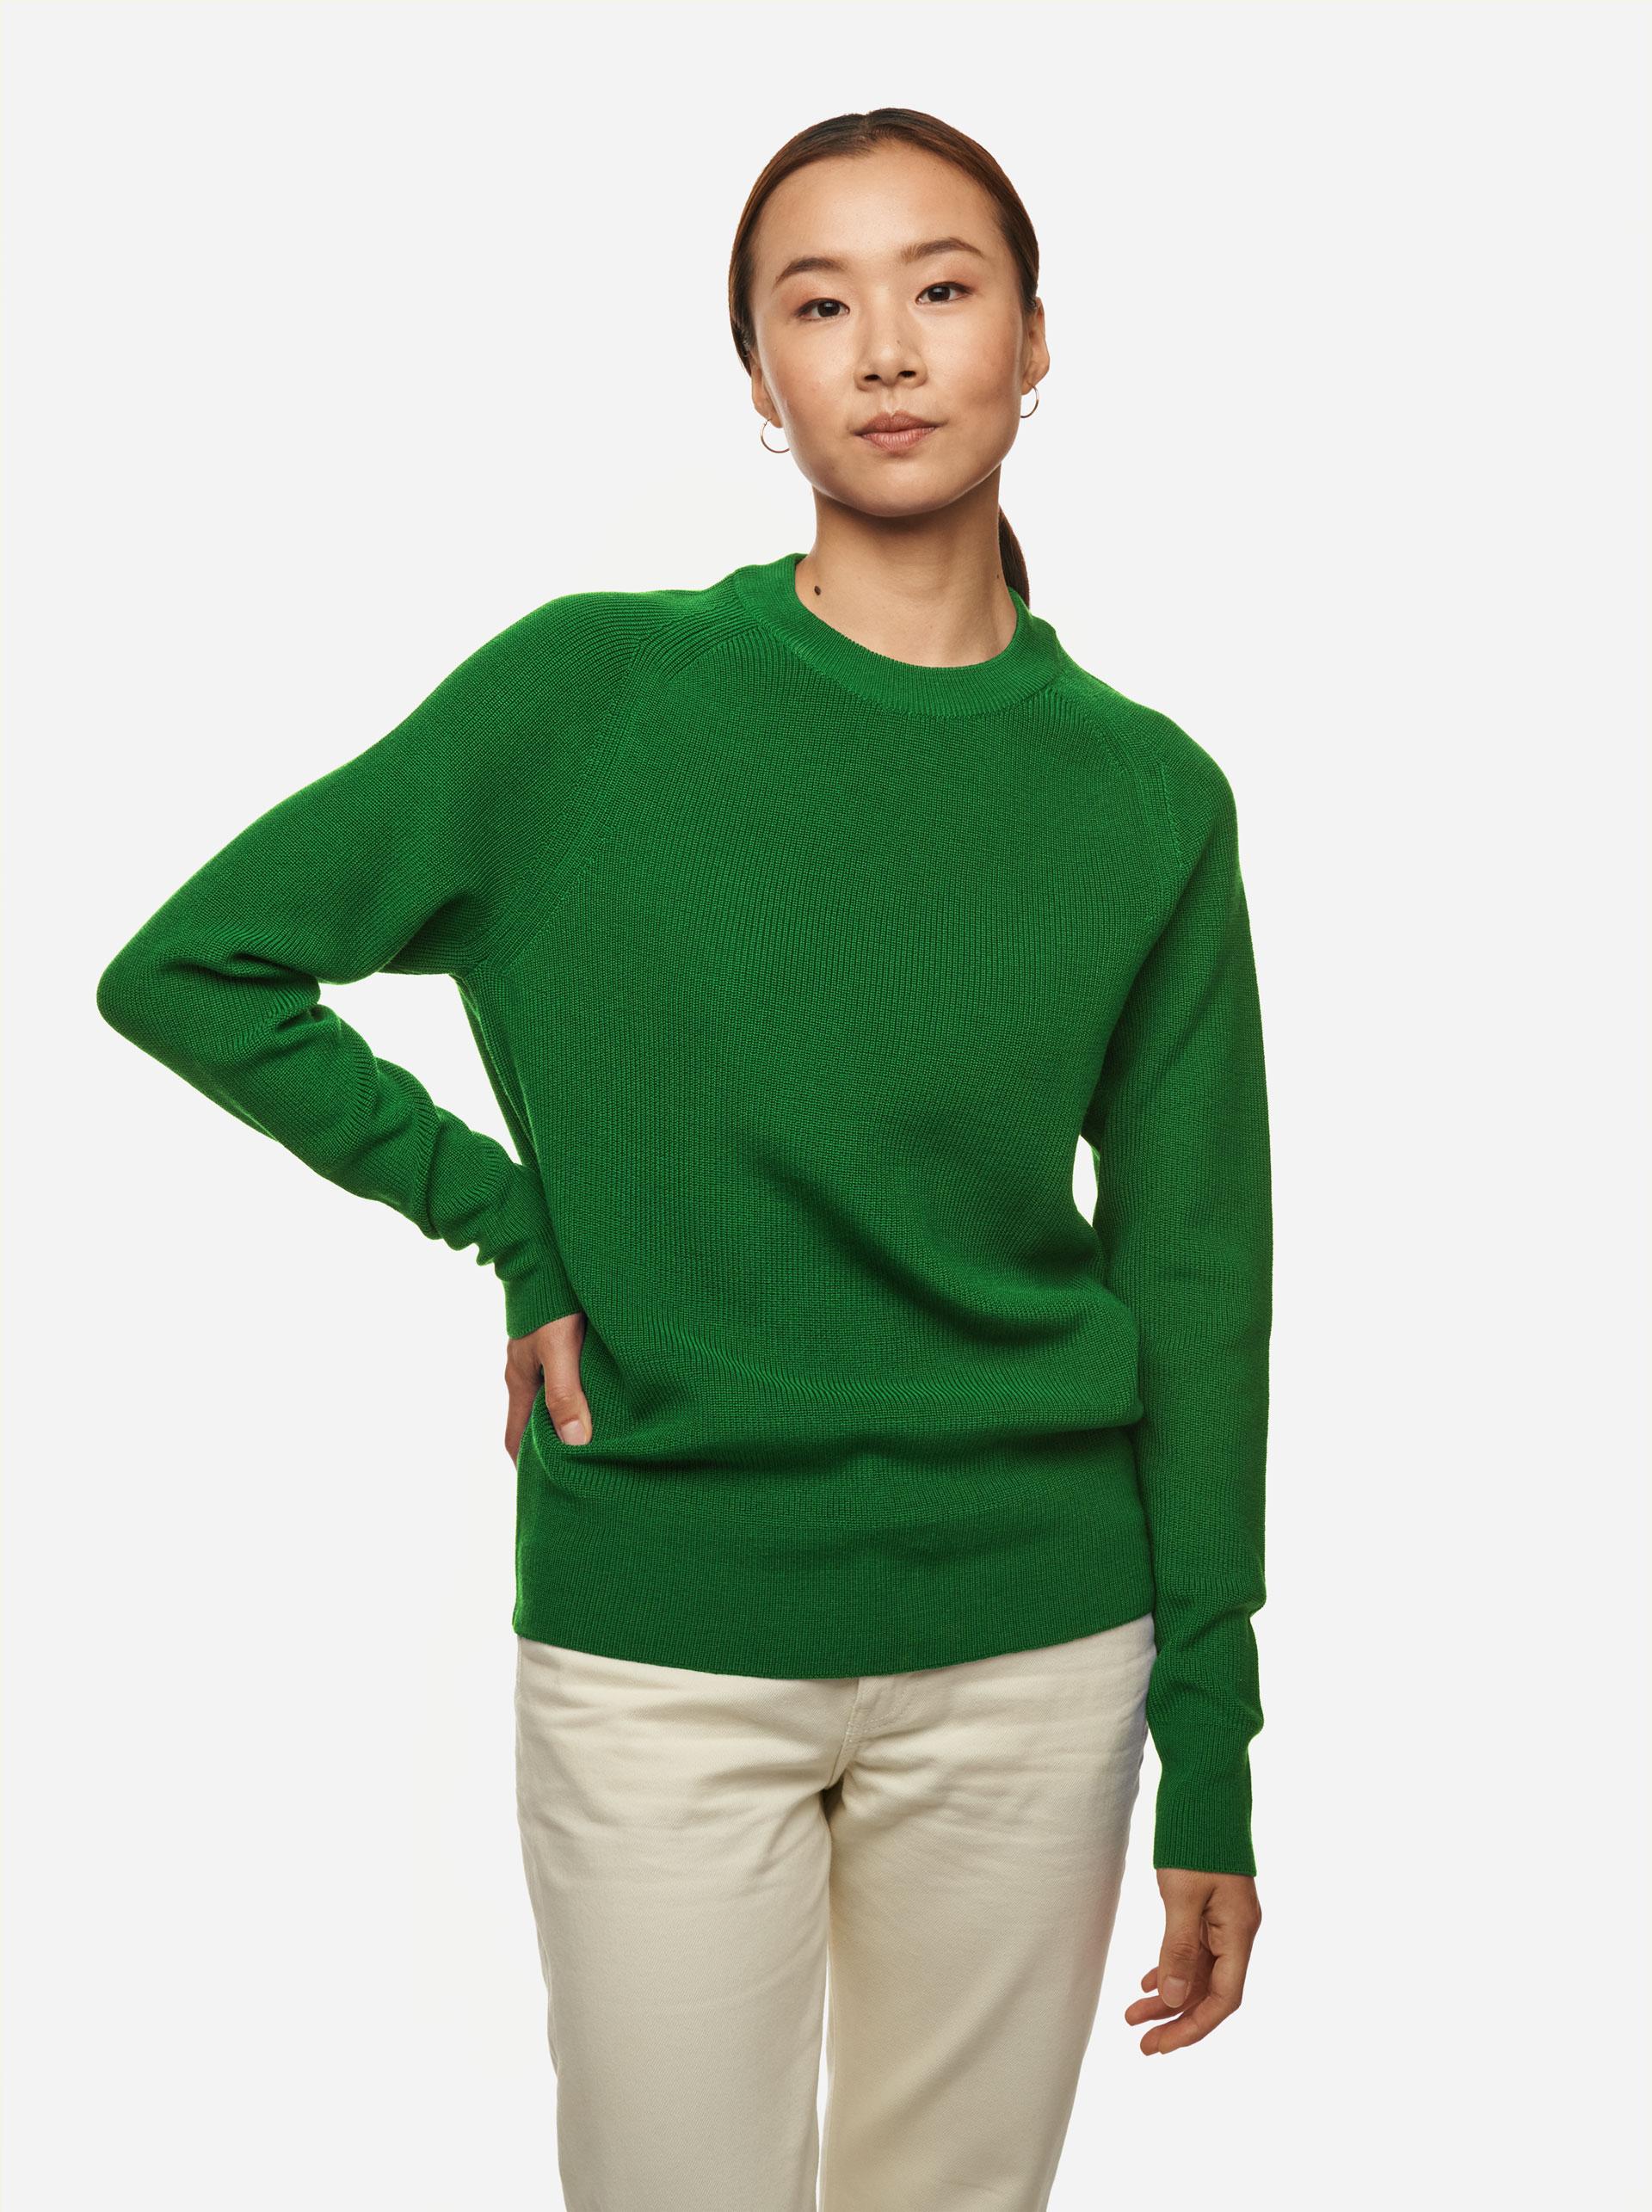 Teym - Crewneck - The Merino Sweater - Women - Brigh Green - 1